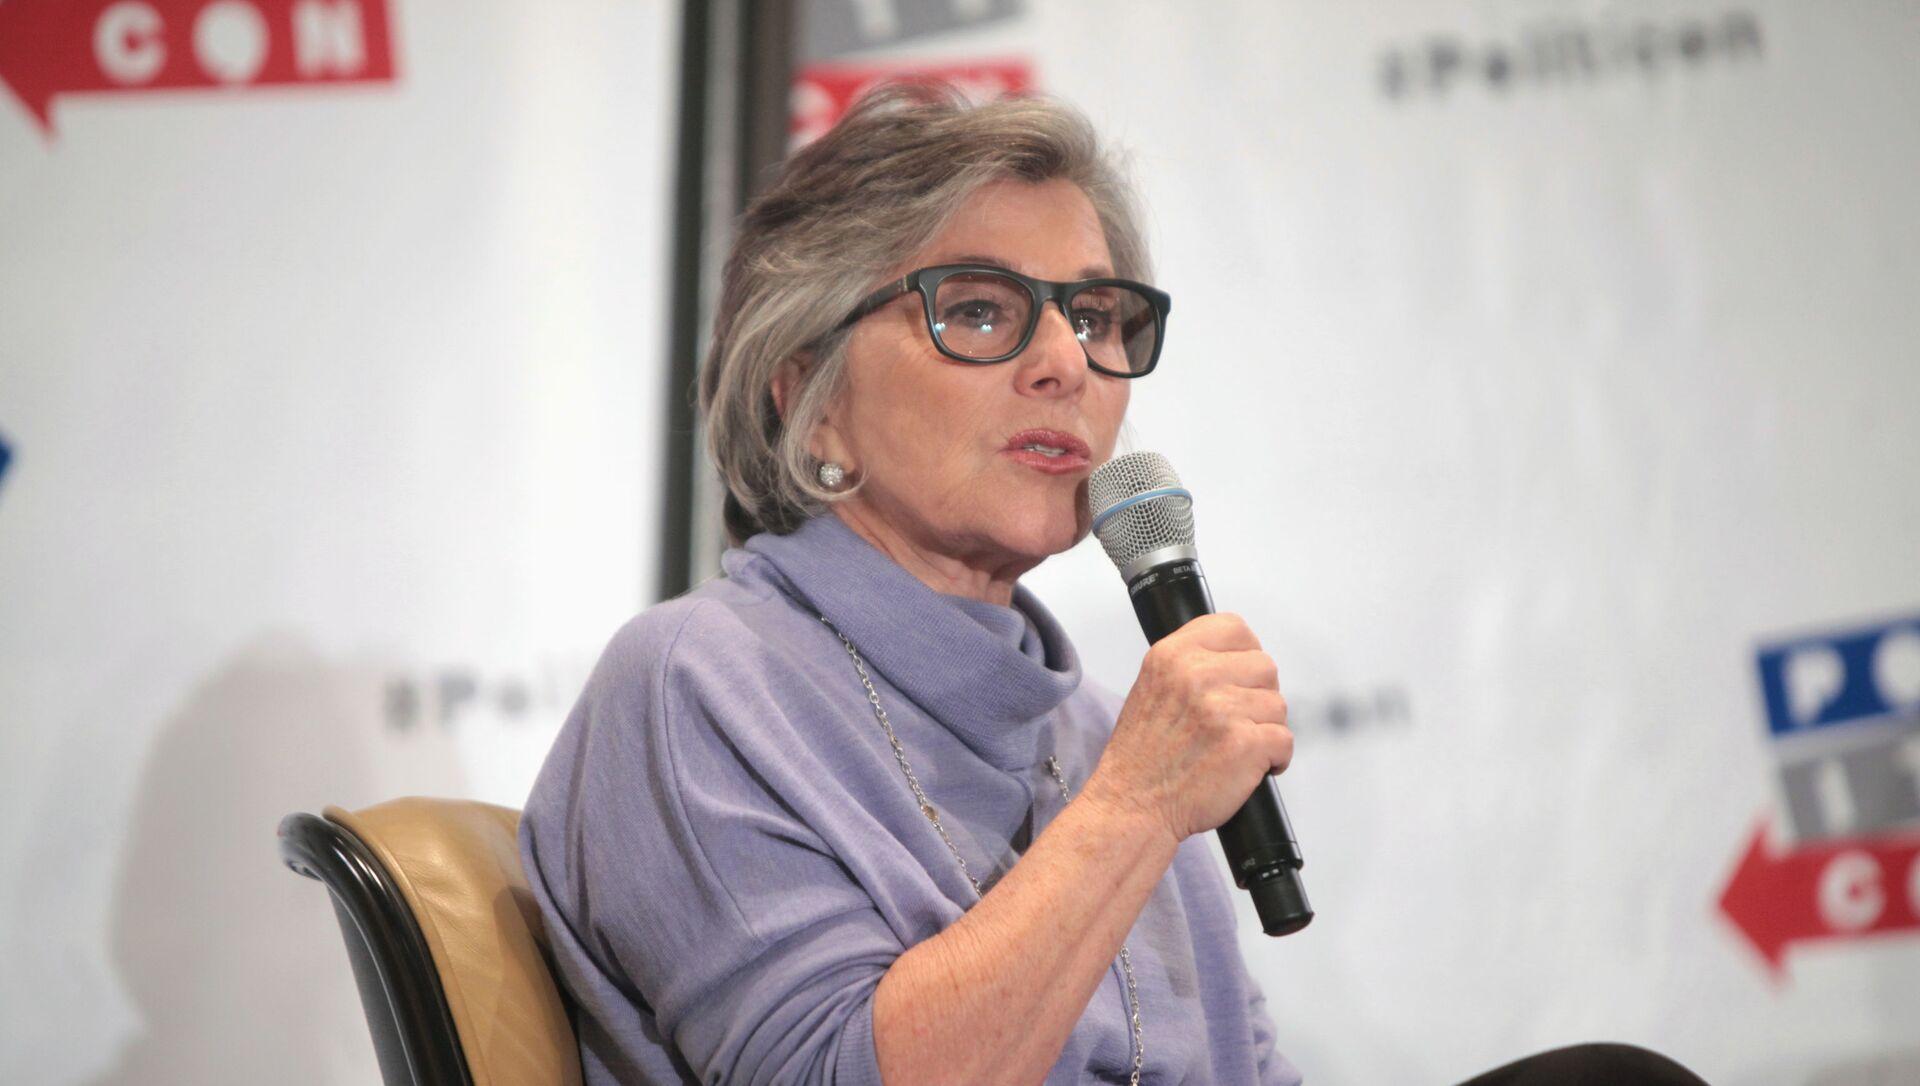 U.S. Senator Barbara Boxer speaking at the 2016 Politicon at the Pasadena Convention Center in Pasadena, California. - Sputnik International, 1920, 27.07.2021